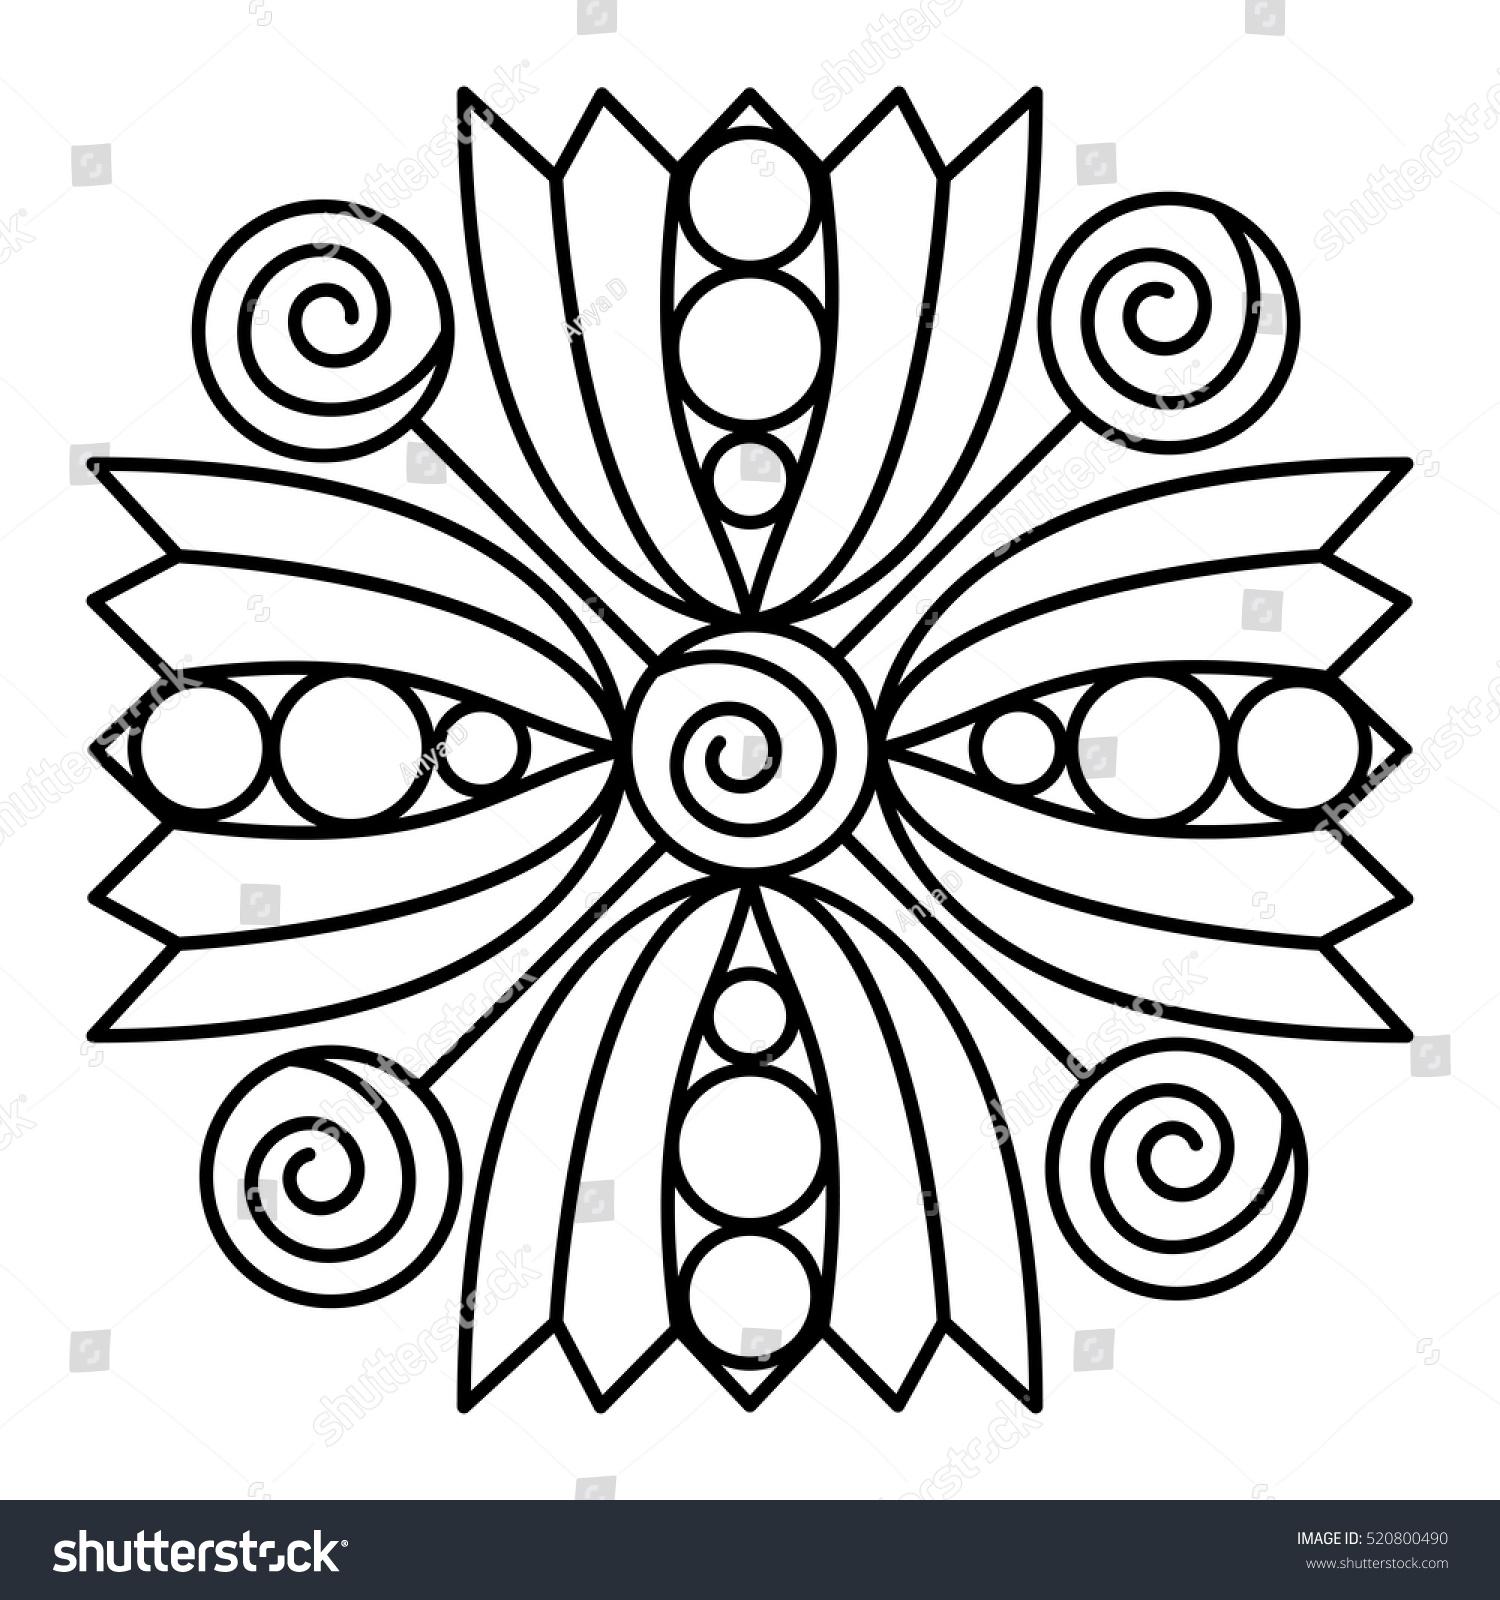 simple flower mandala pattern coloring book stock vector 520800490